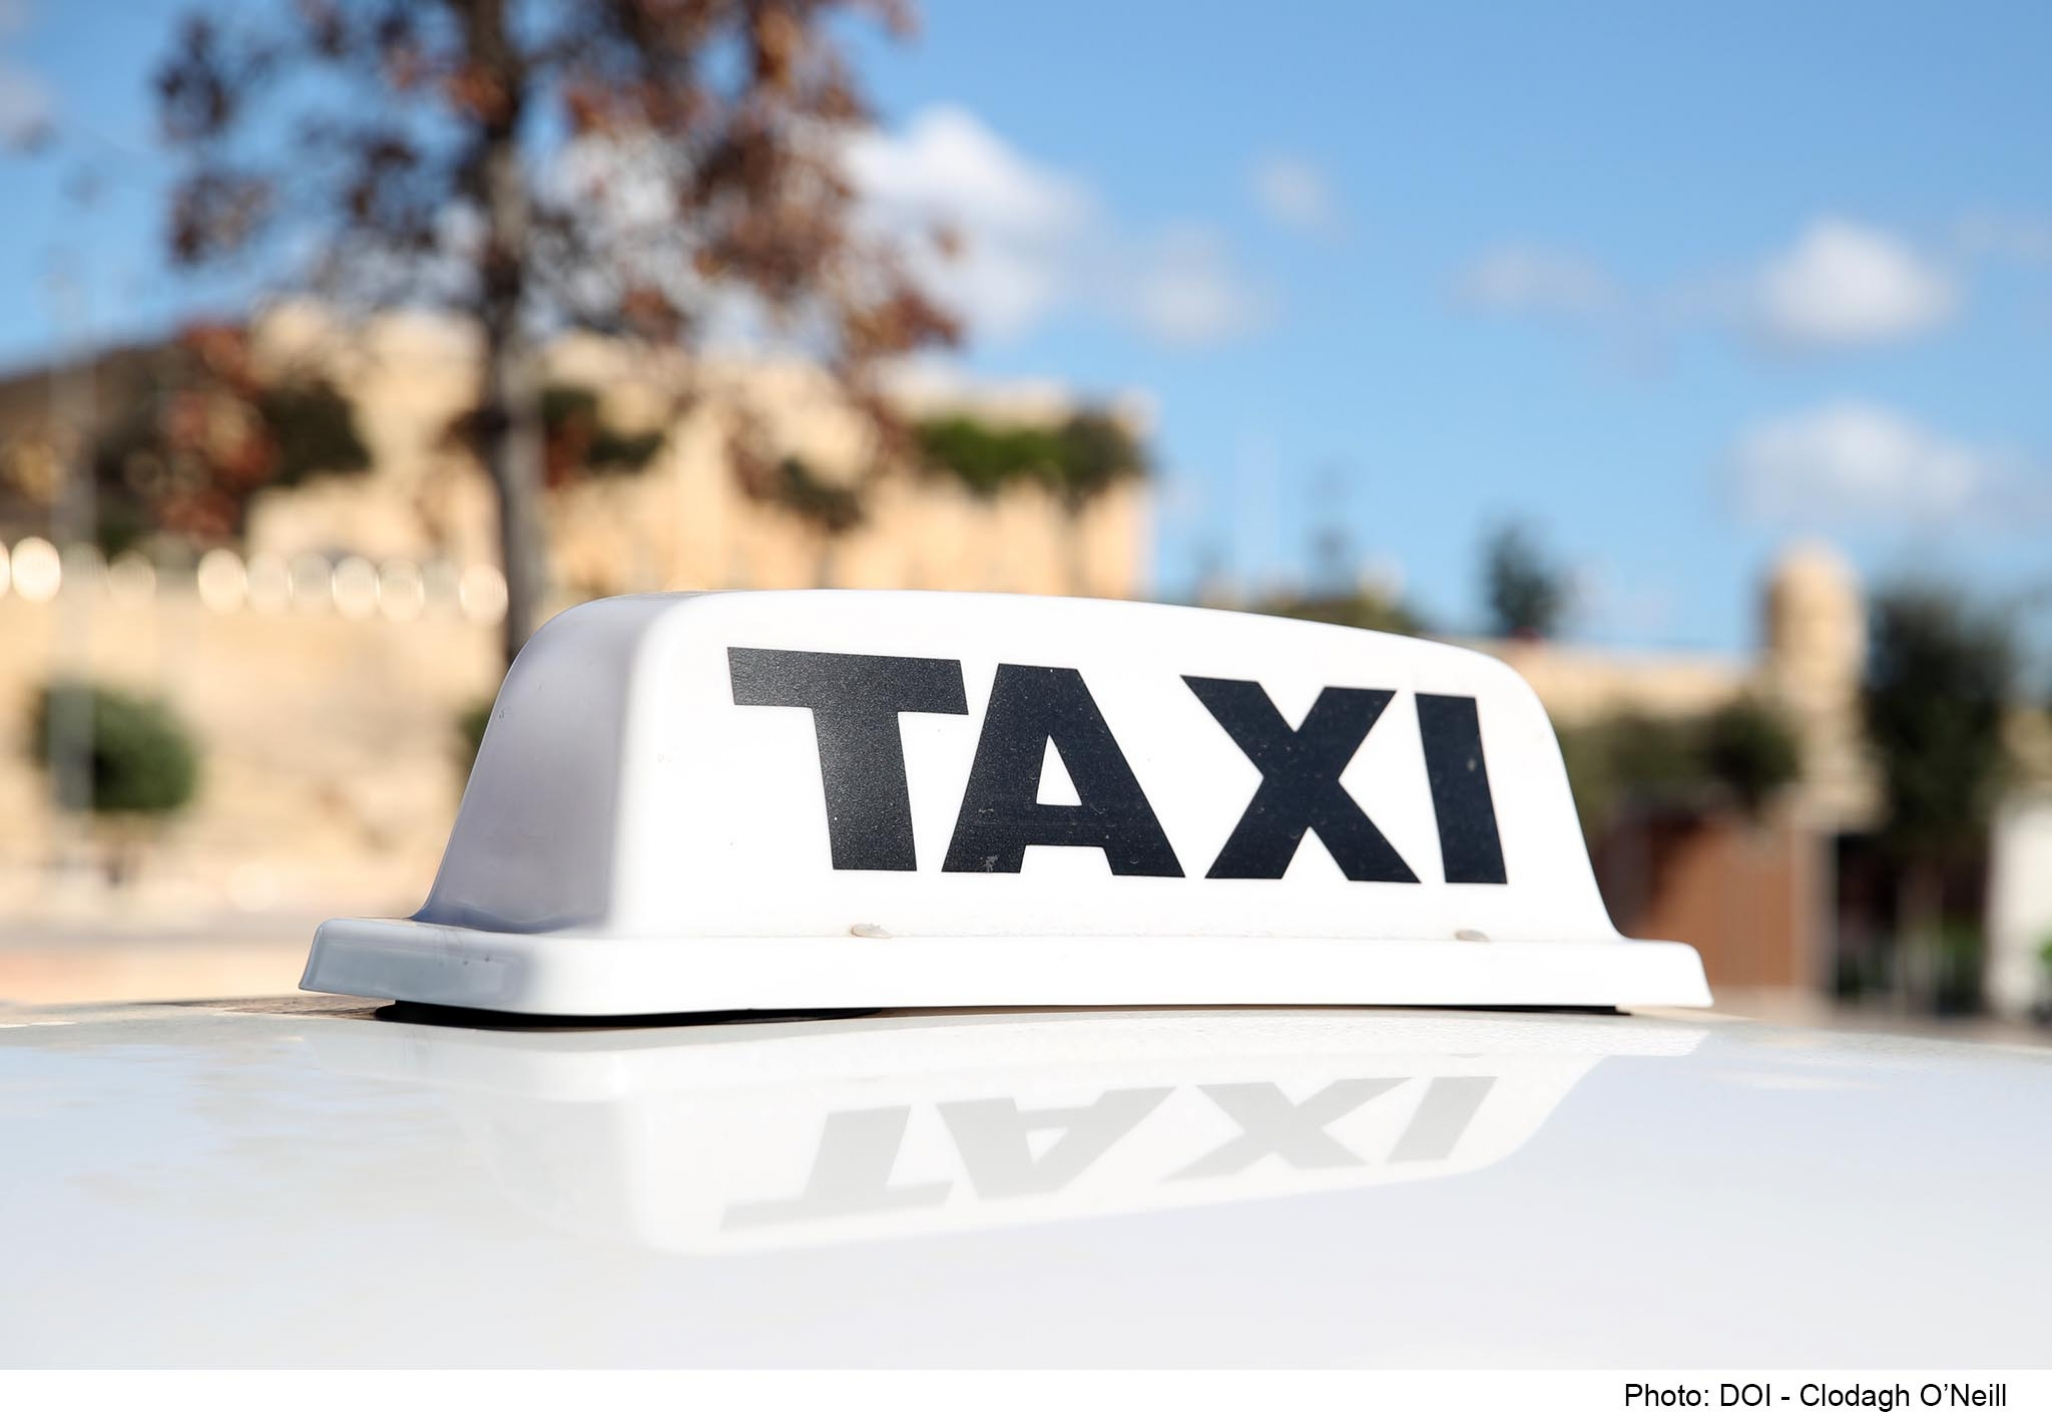 TaxiMeter2